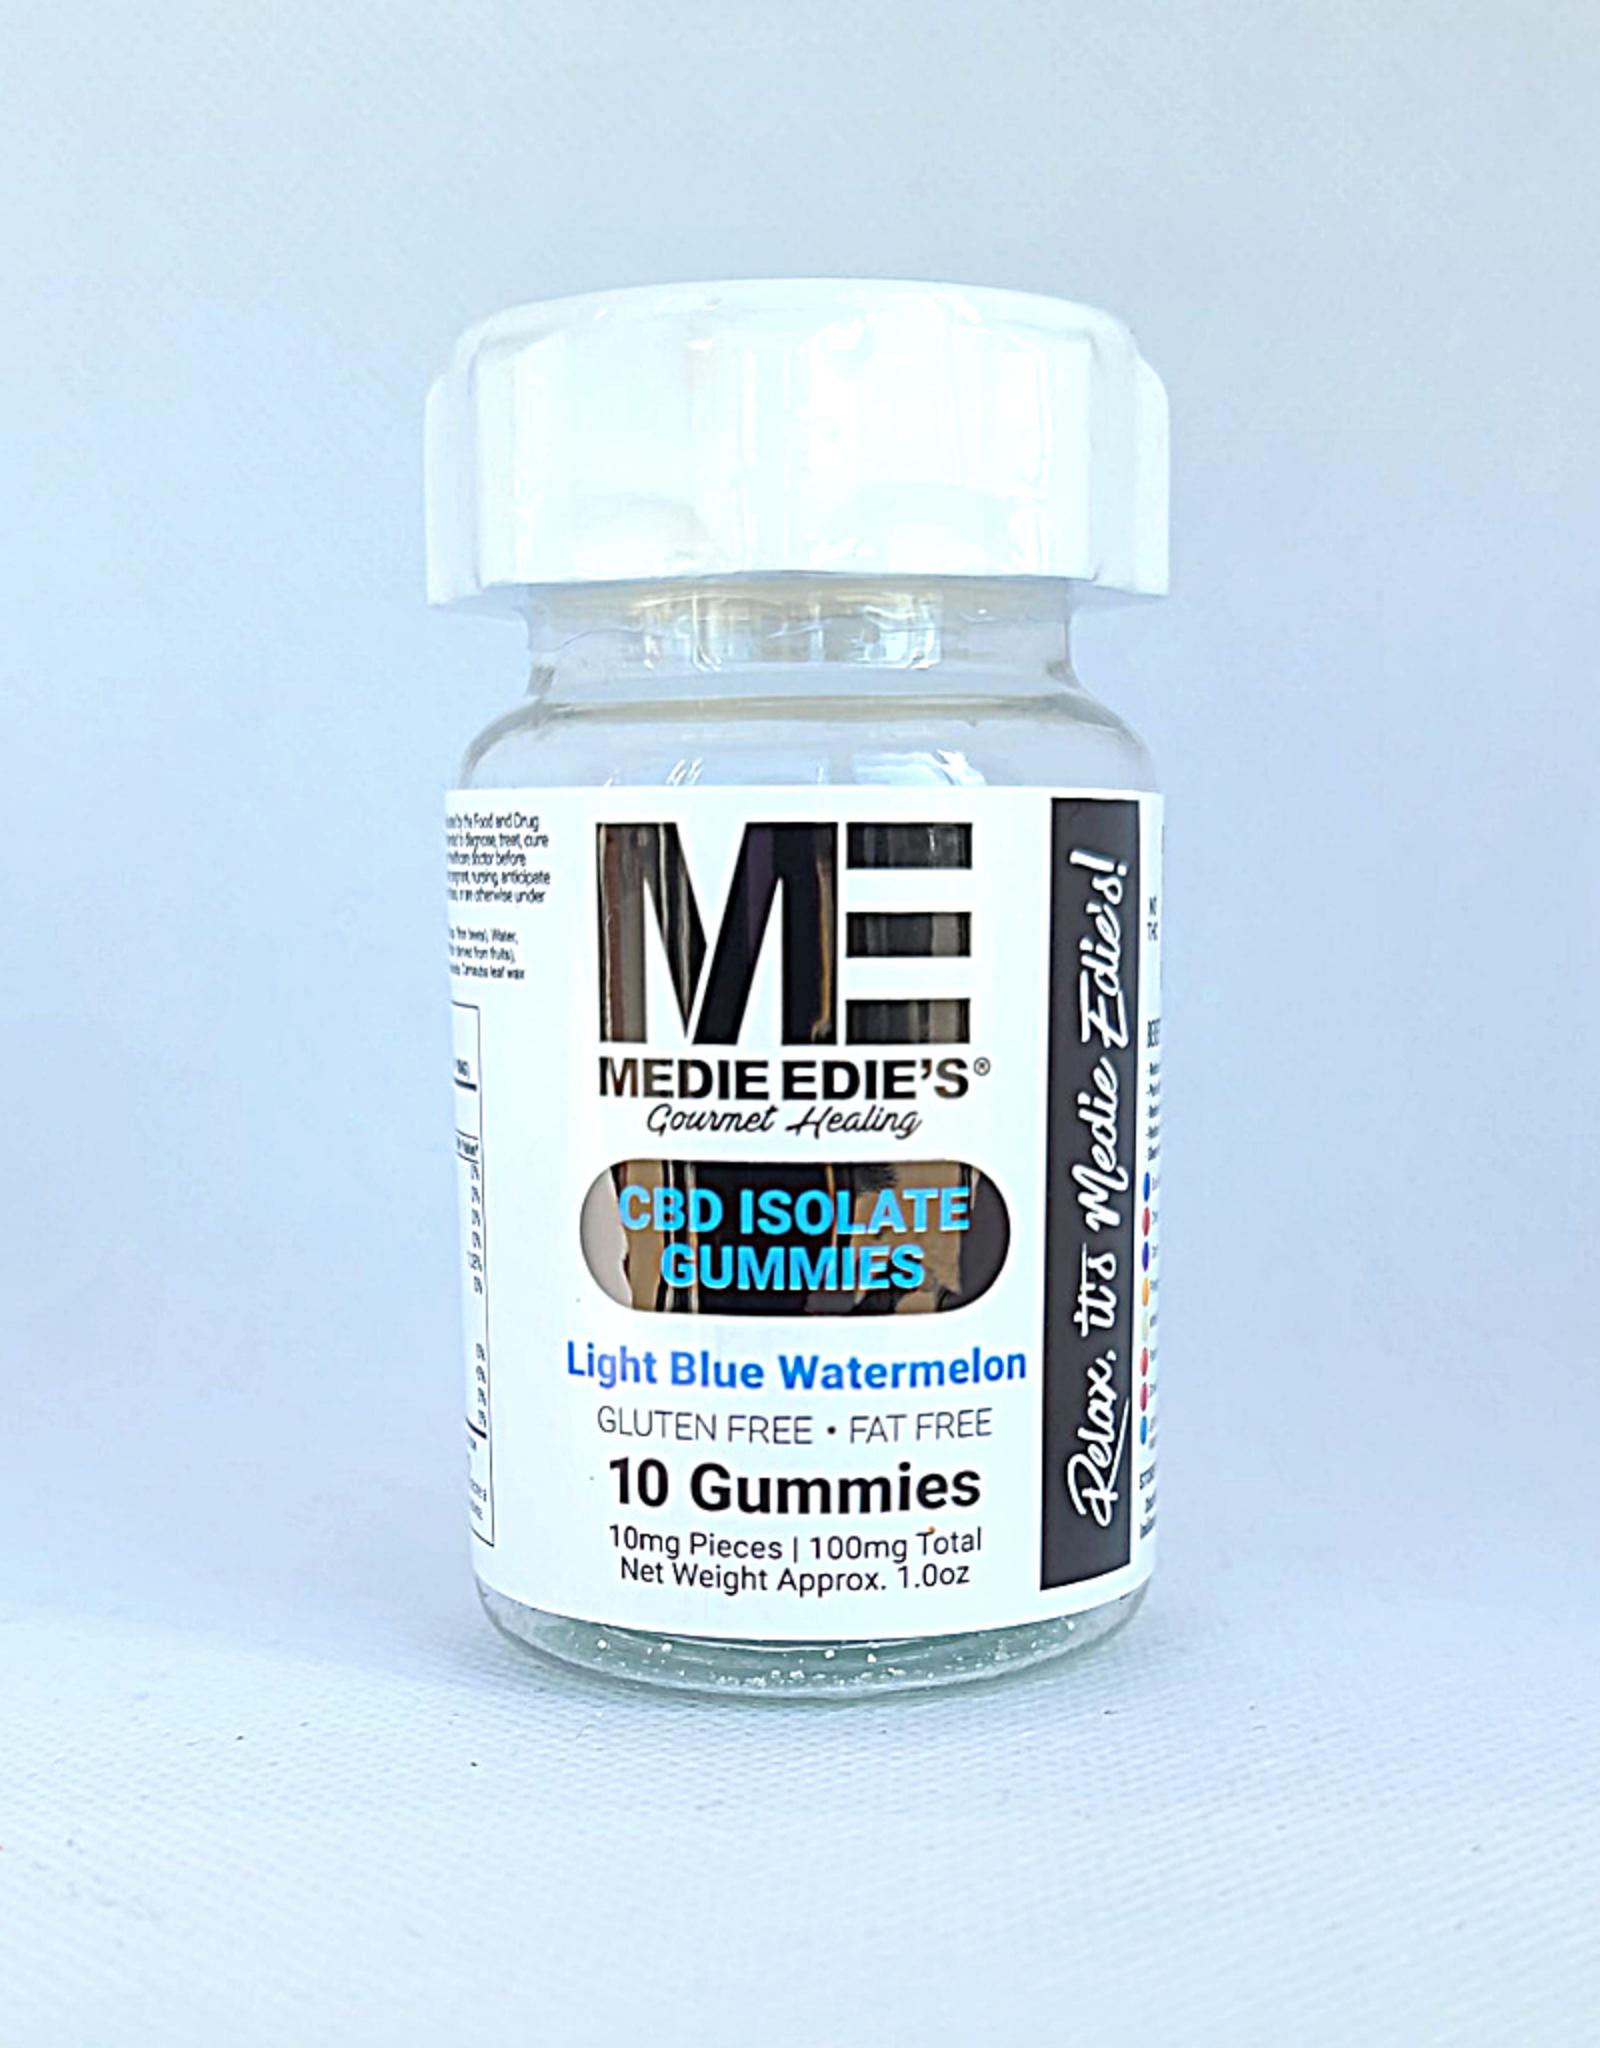 Medie Edie's Light Blue Watermelon CBD Gummies - 10ct/10mg/100mg